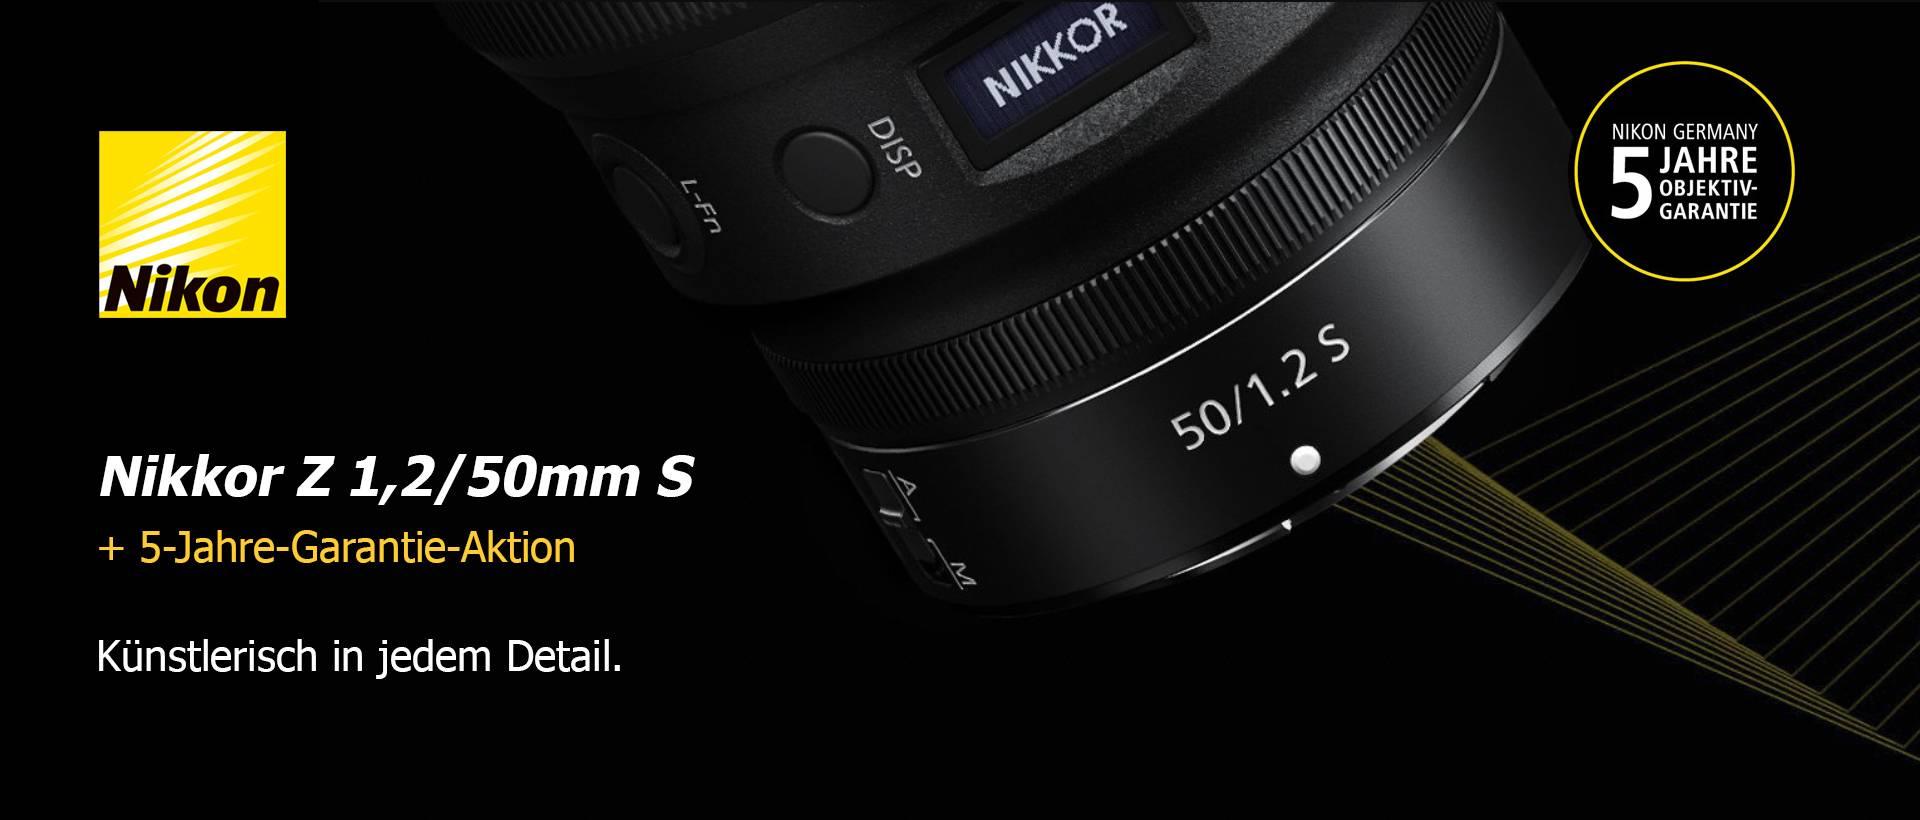 Nikon Z 1,2/50mm S + 5-Jahre-Garantie-Aktion